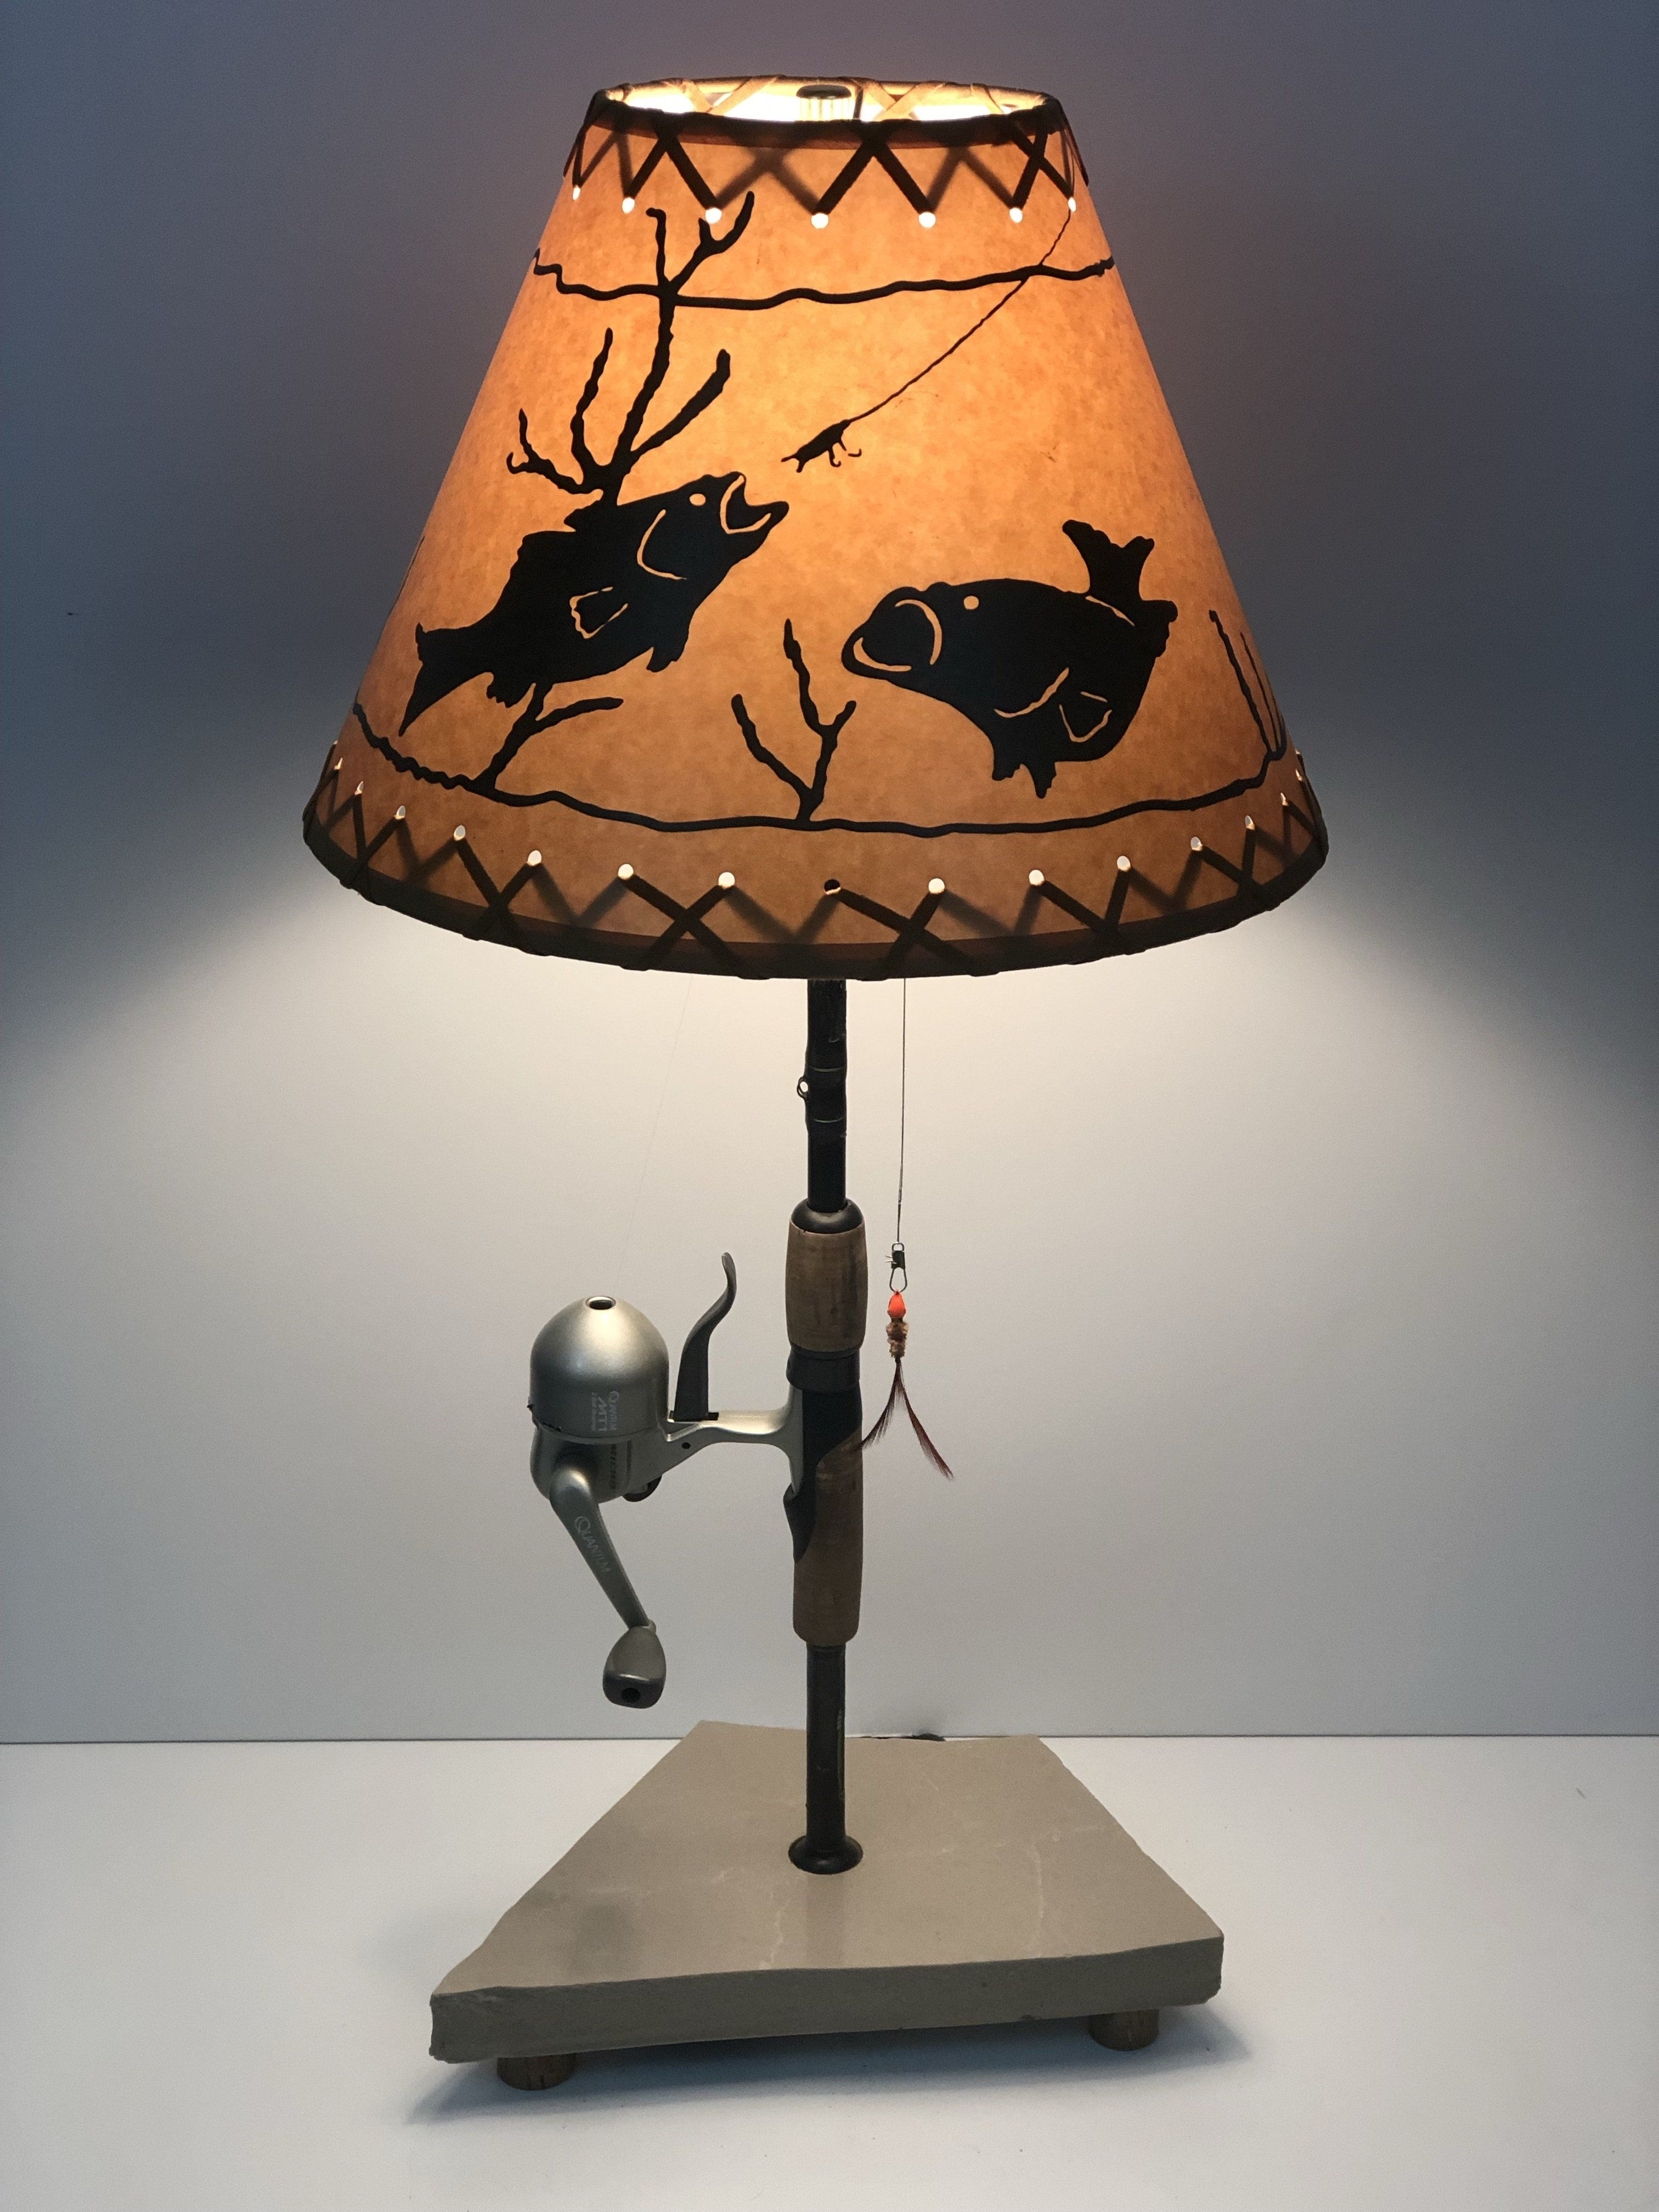 Night Stand Lamp #1556 | Nightstand lamp, Table lamp ...